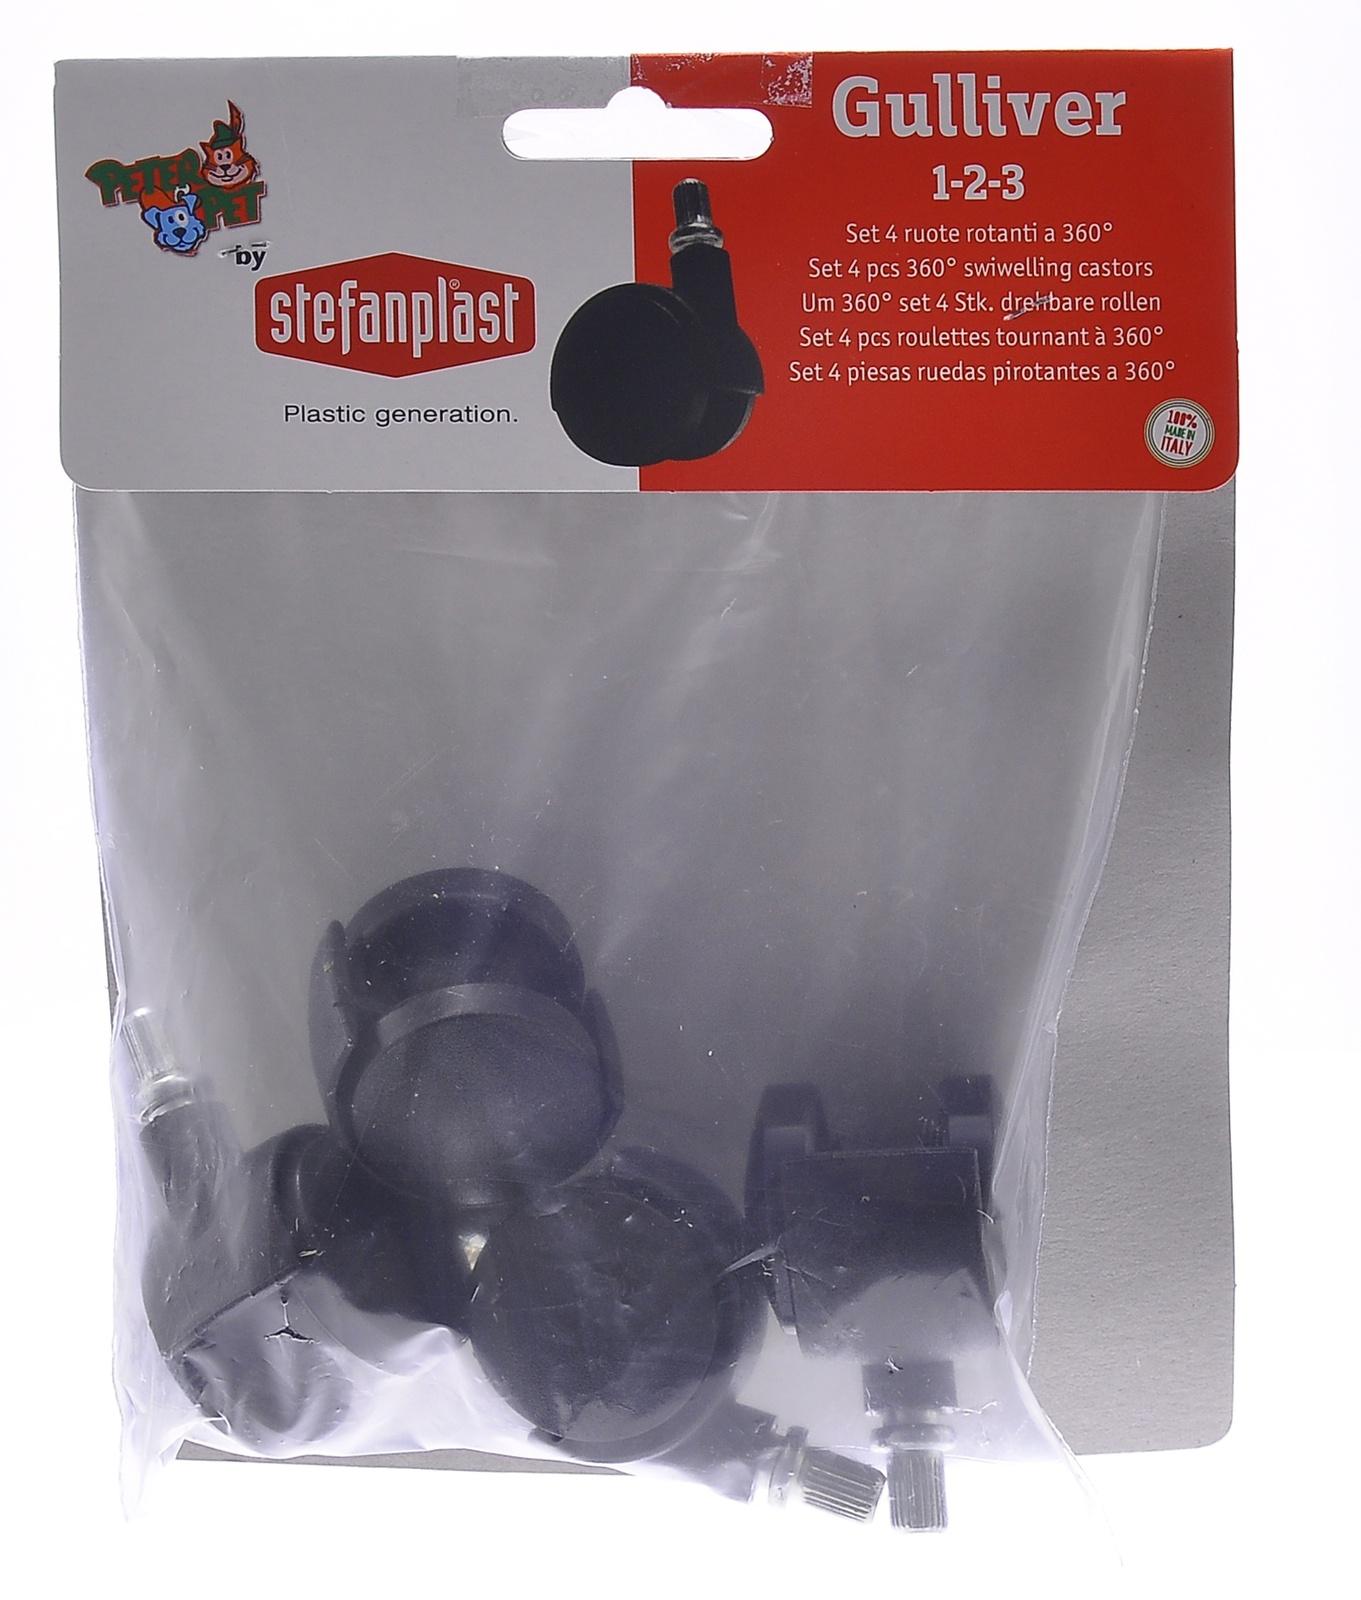 stefanplast Stefanplast Колеса для переносок Gulliver и Gulliver Deluxe 1,2,3 (Set 4 360° castors)96330 10383